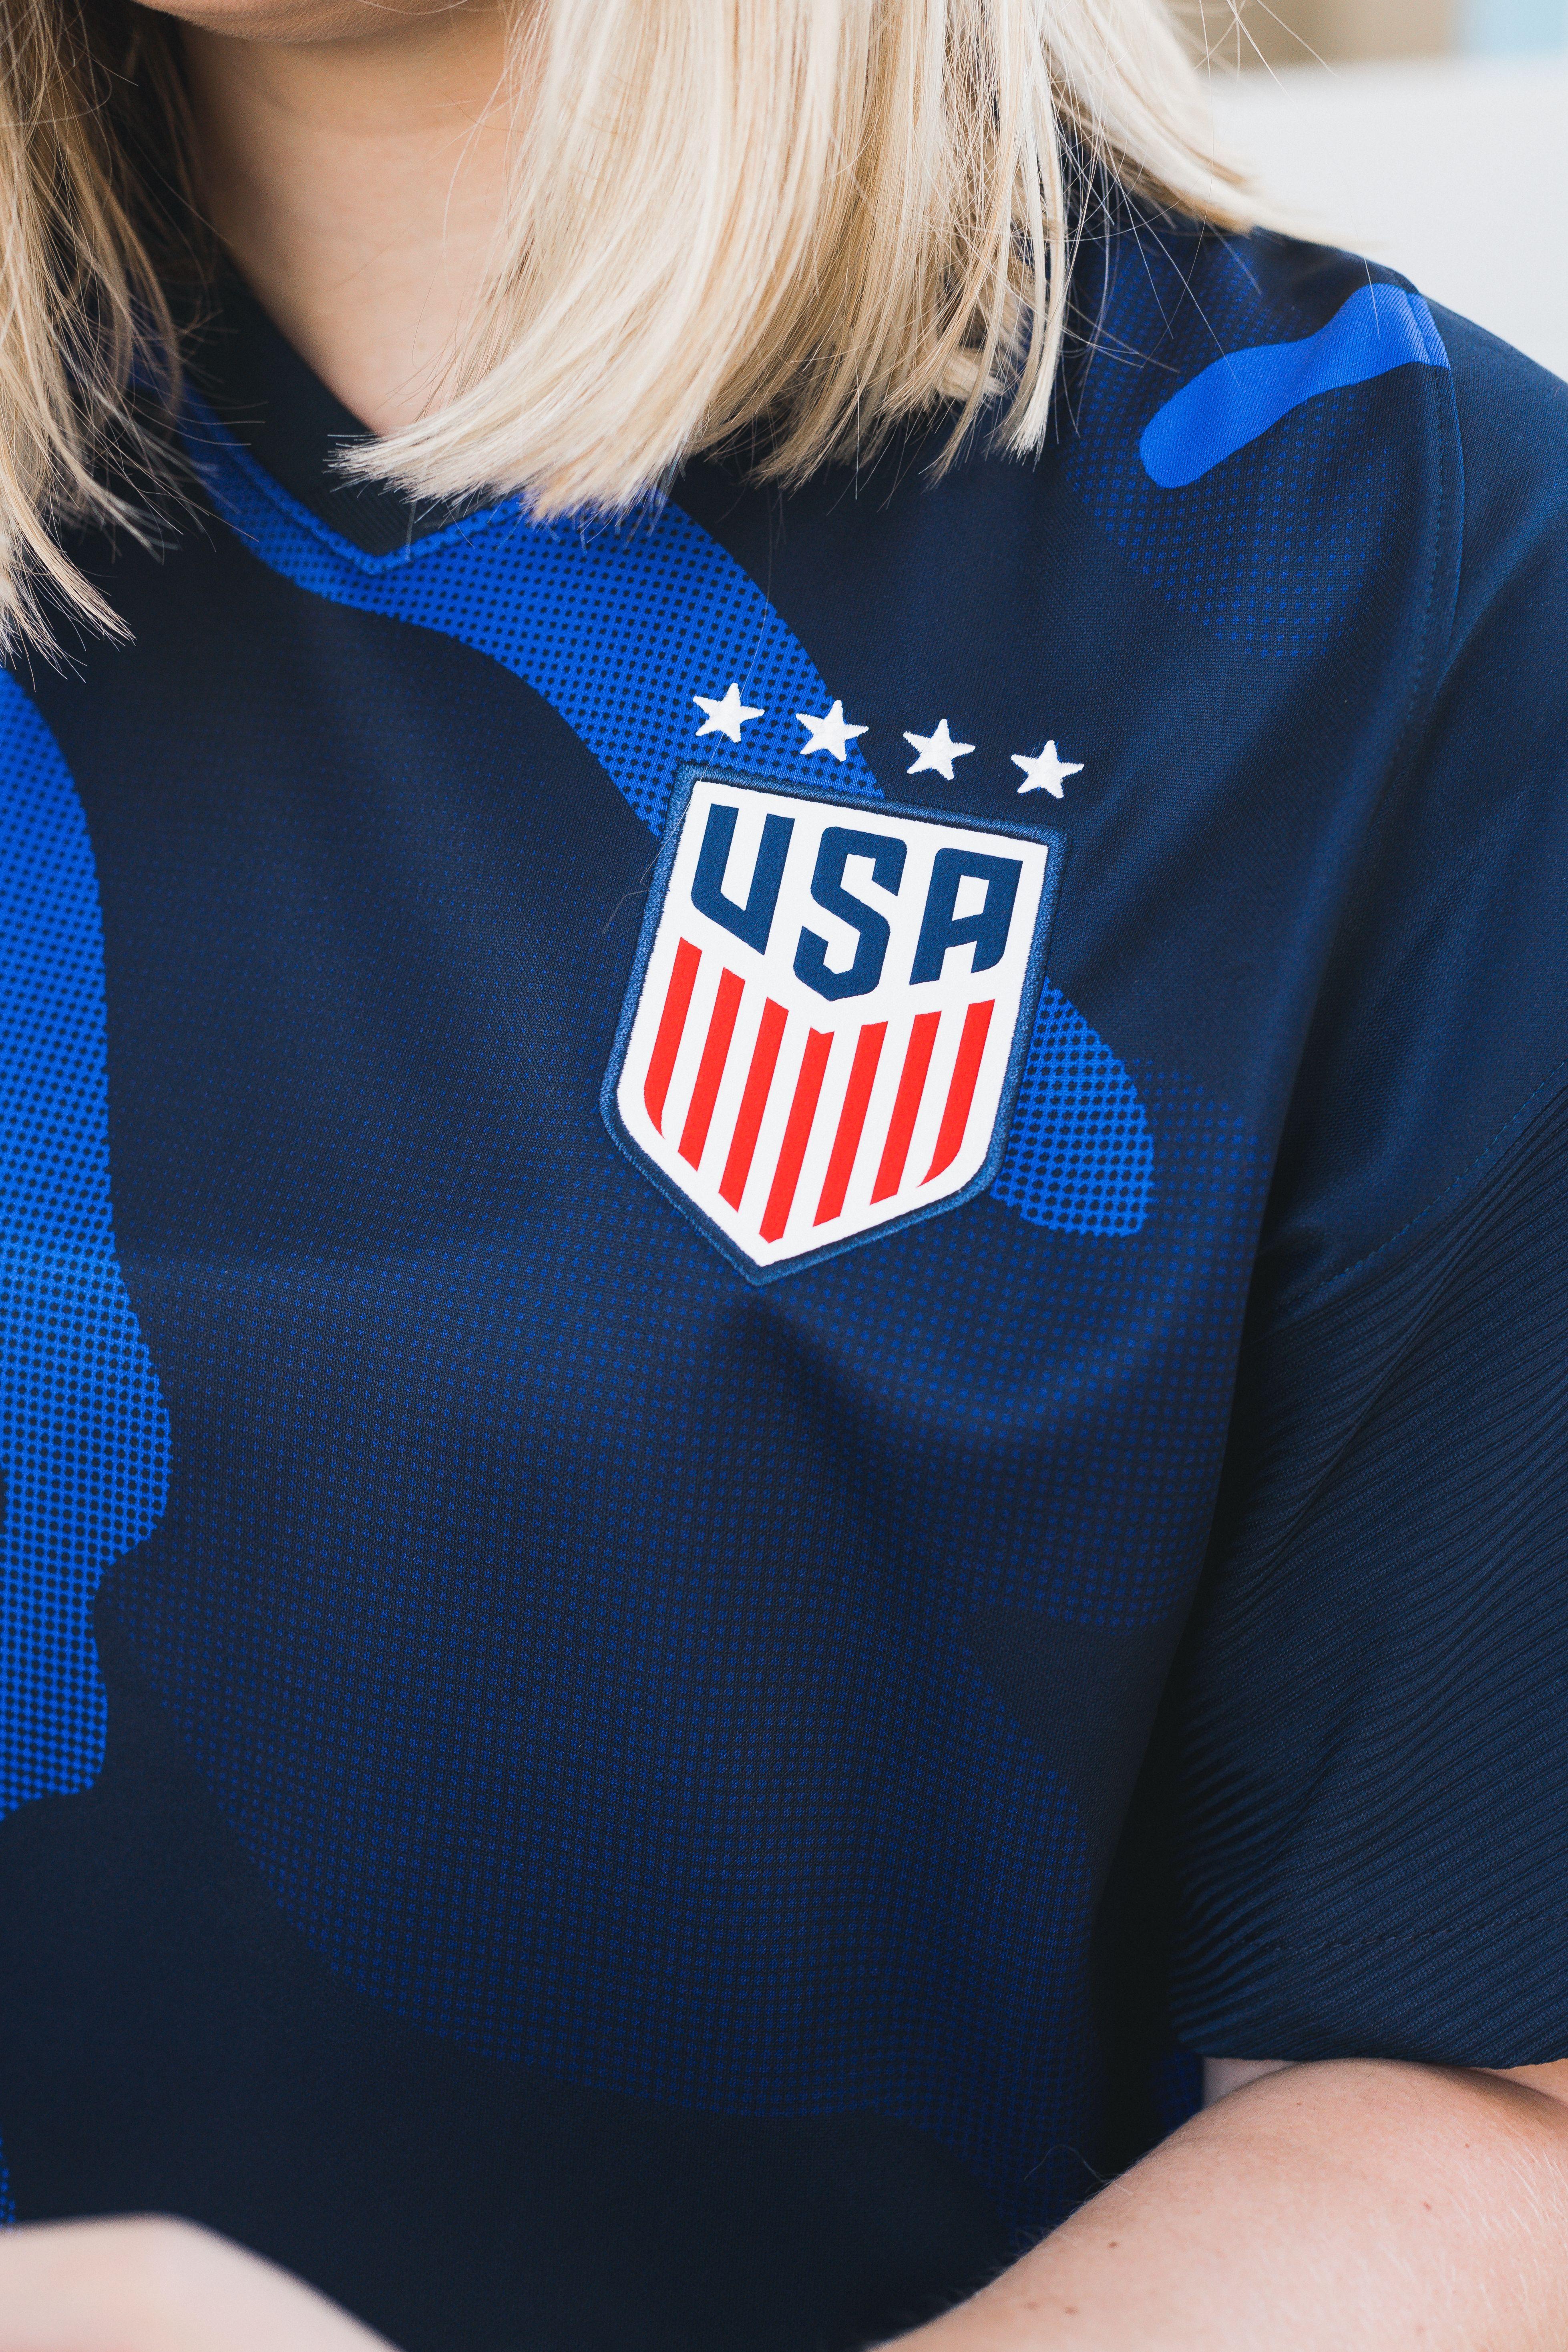 Nike Uswnt Away Jersey 2020 In 2020 Usa Soccer Jersey Soccer Jersey Usa Soccer